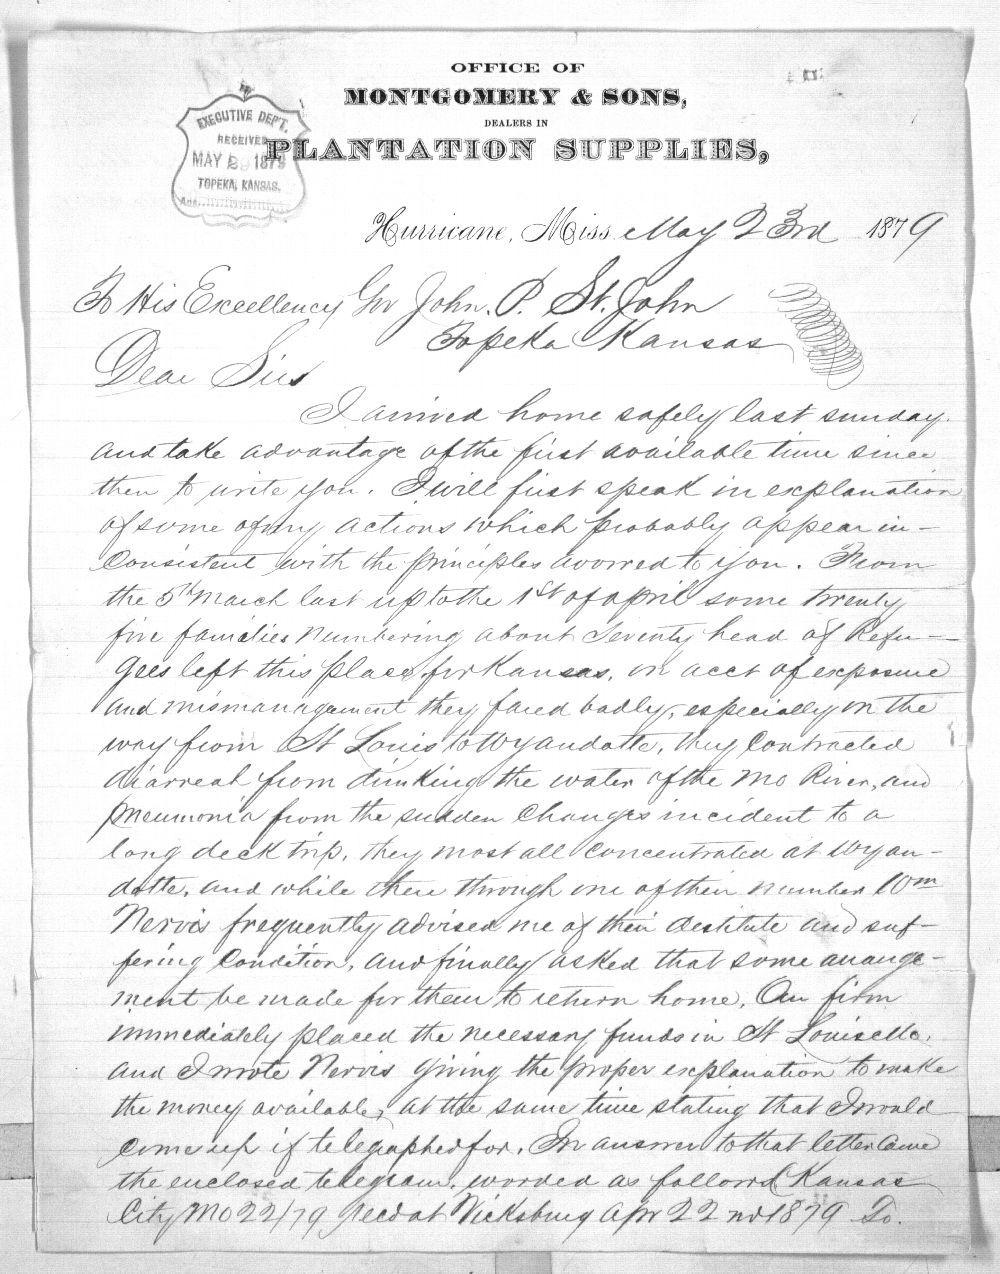 Isaiah T. Montgomery to Governor John P. St. John - 1